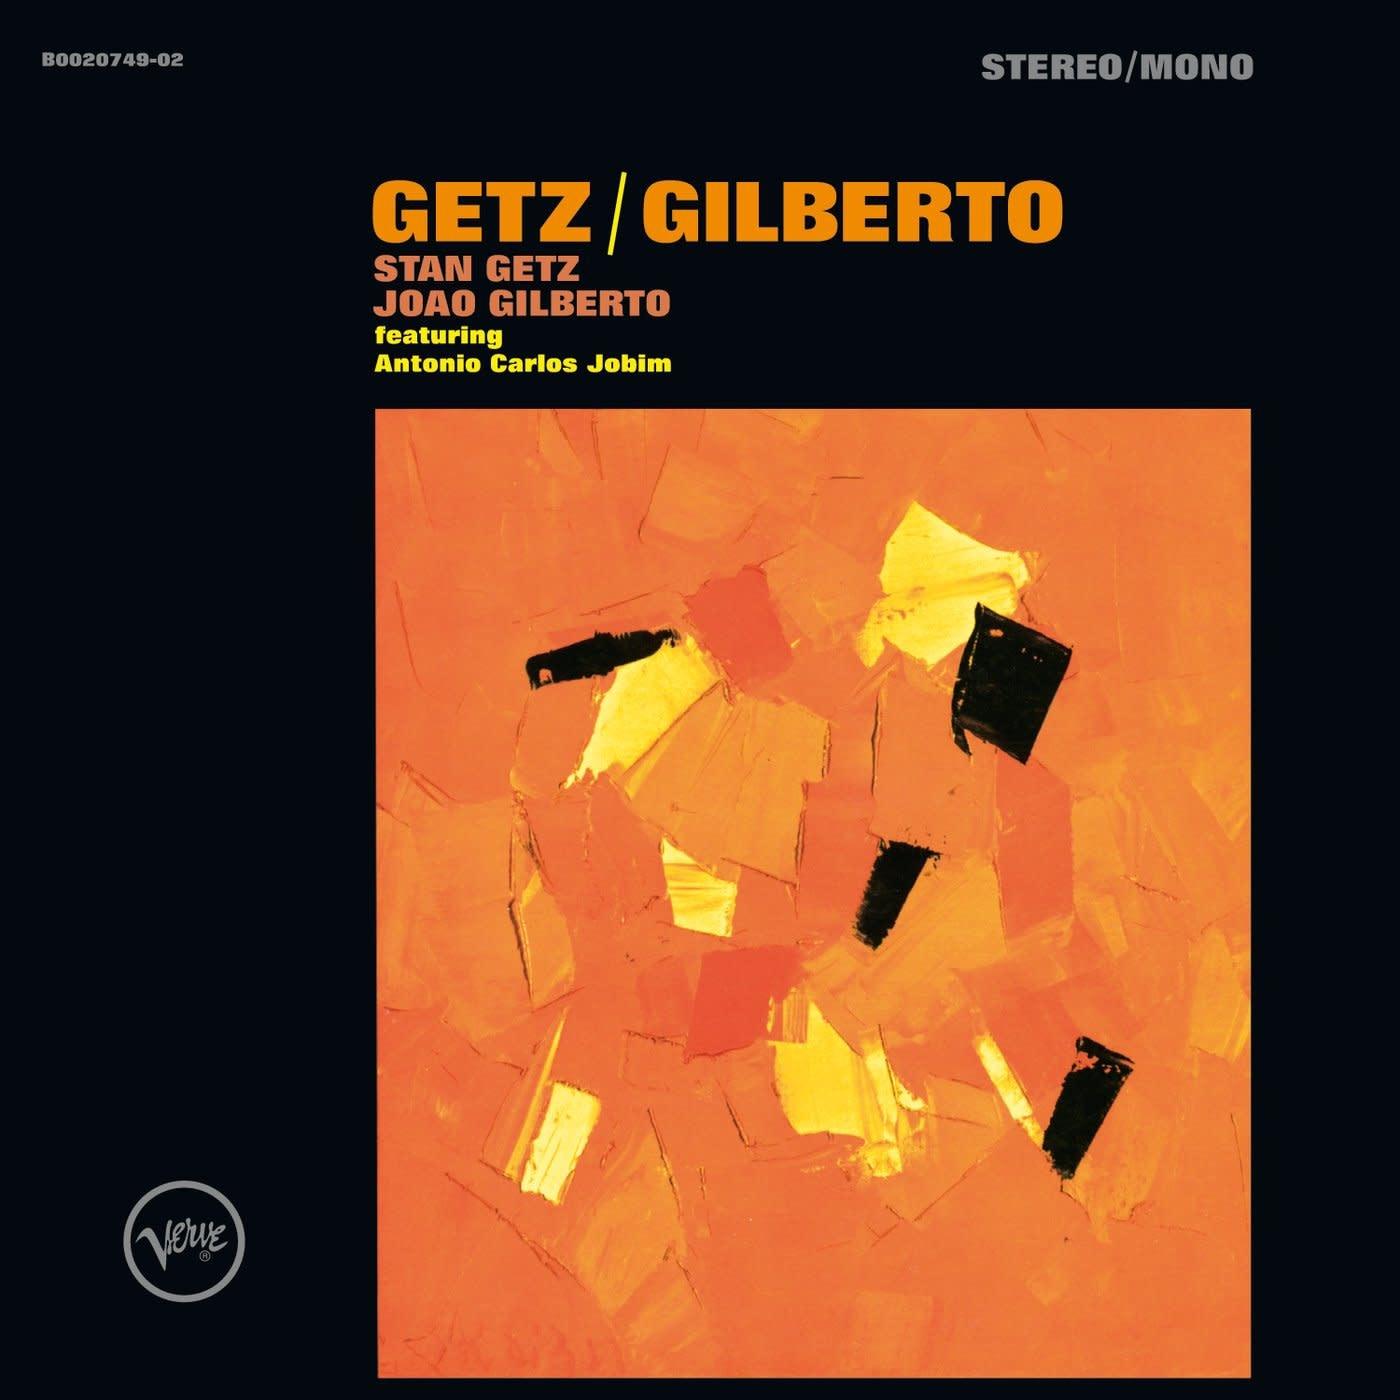 Stan Getz / Joao Gilberto Featuring Antonio Carlos Jobim • Getz / Gilberto-1